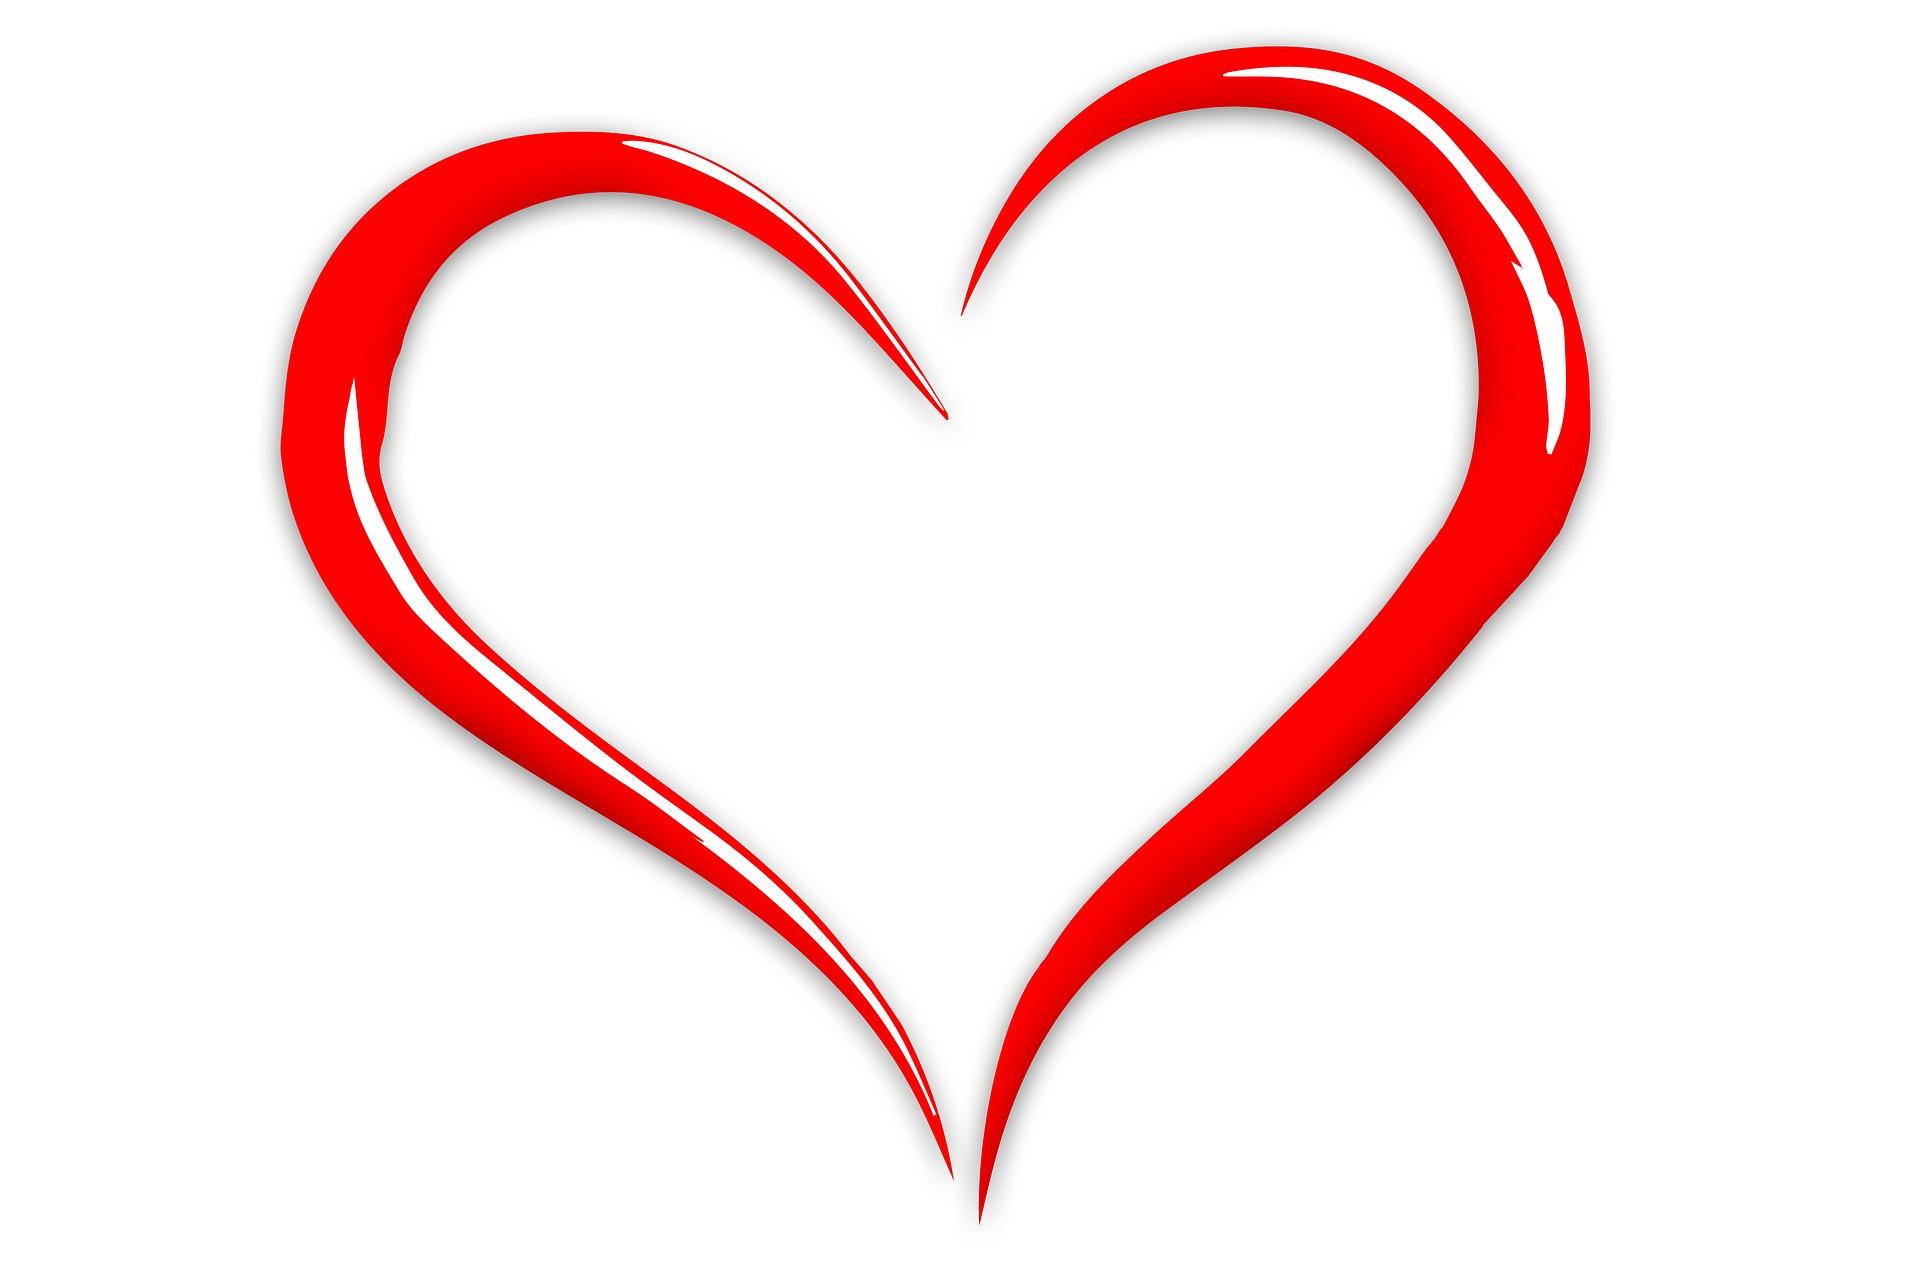 love-1985748_1920